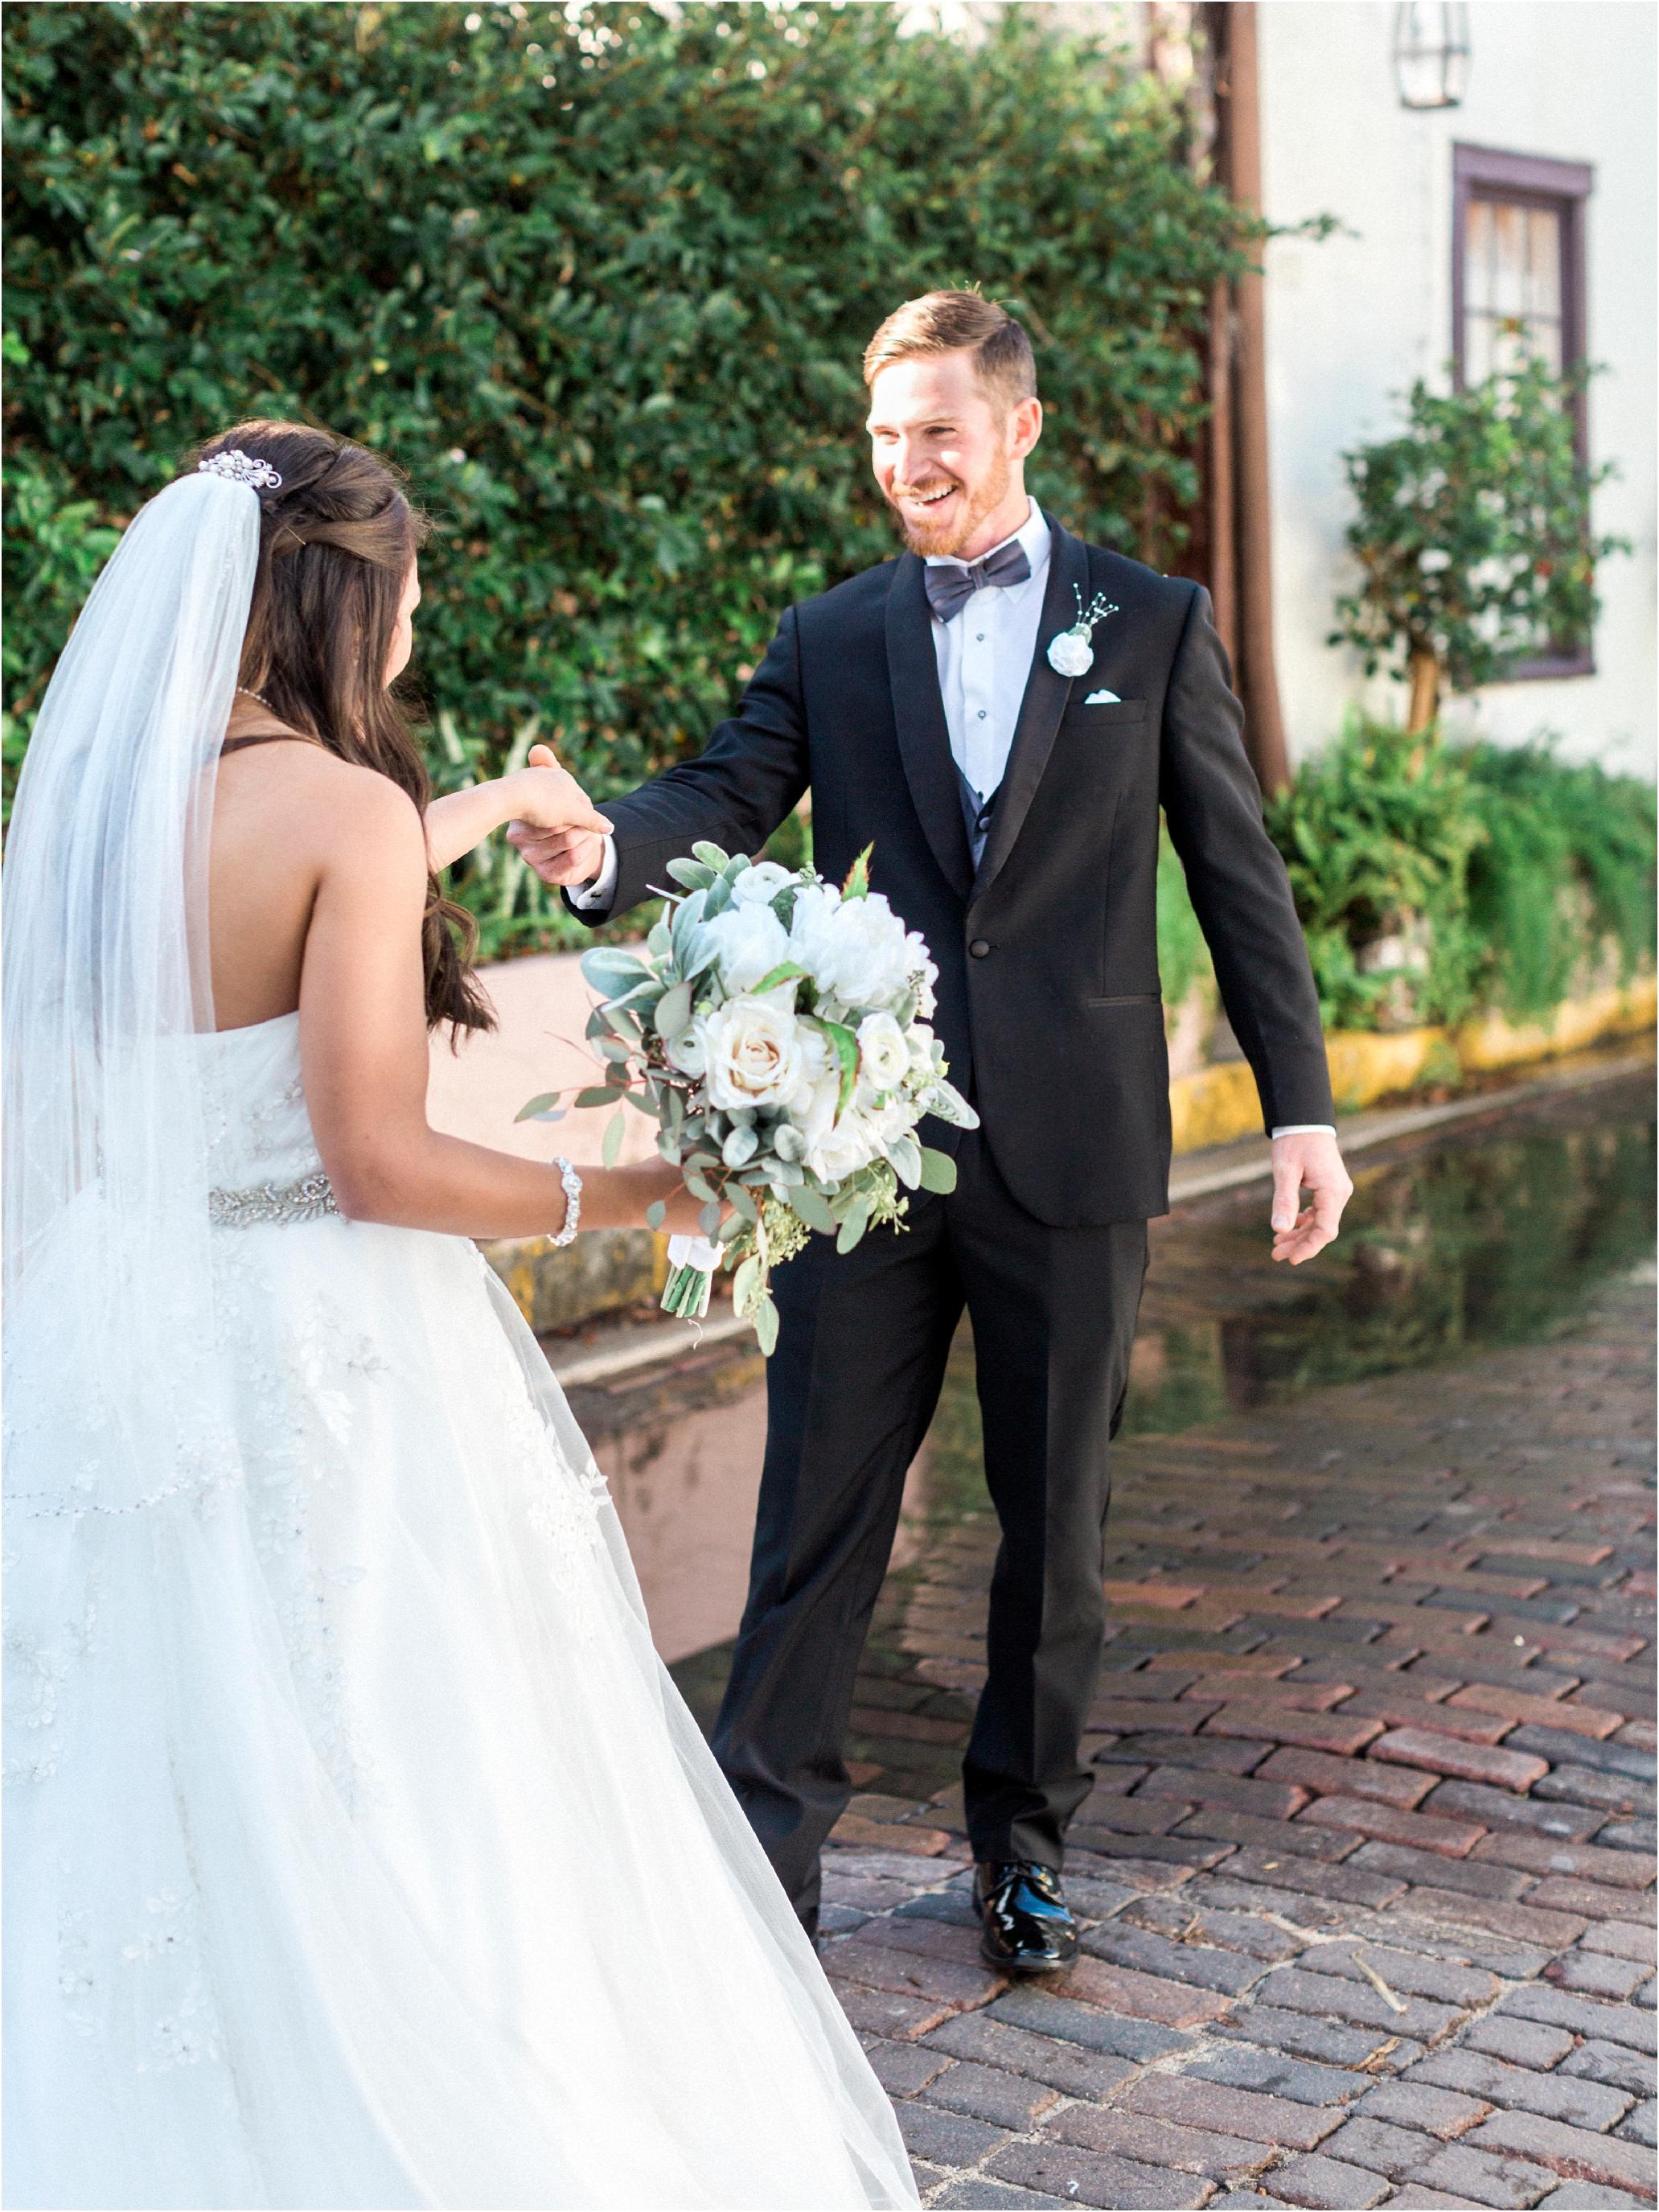 Lisa Silva Photography- Ponte Vedra Beach and Jacksonville, Florida Fine Art Film Wedding Photography- Wedding at The White Room Villa Blanca in St. Augustine, Florida_0034.jpg